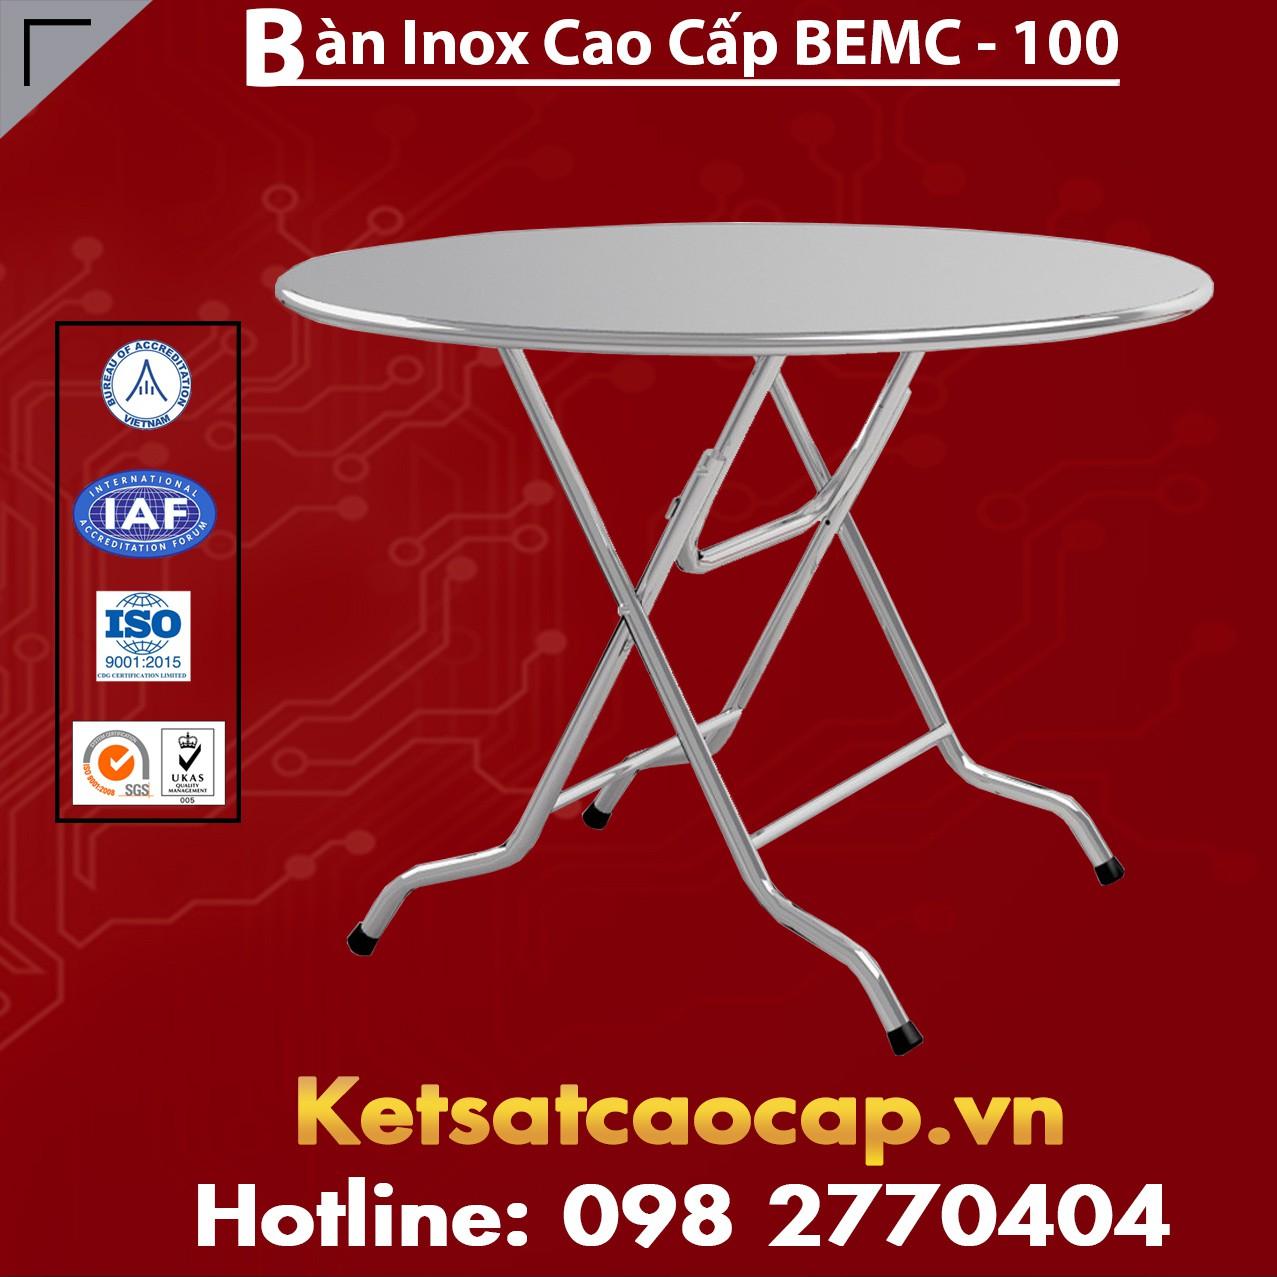 Bàn Inox Cao Cấp BEMC - 100